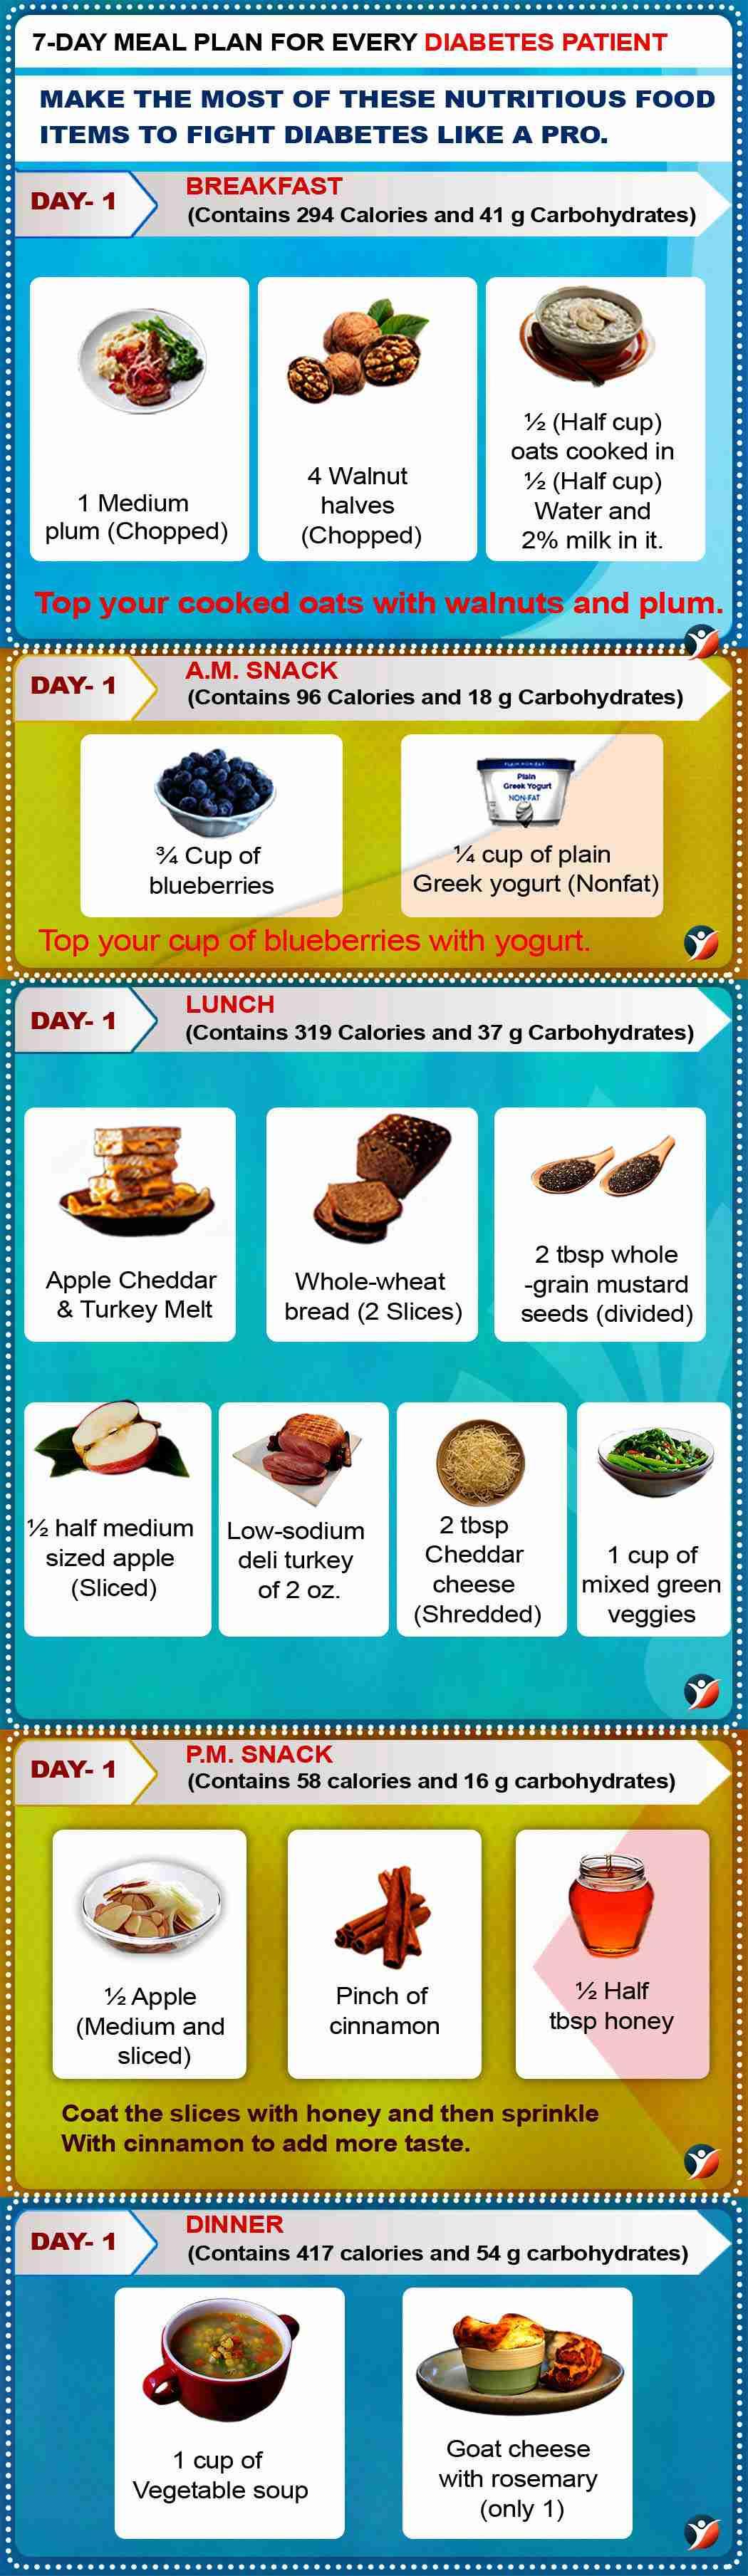 diabetes diet plan day 1